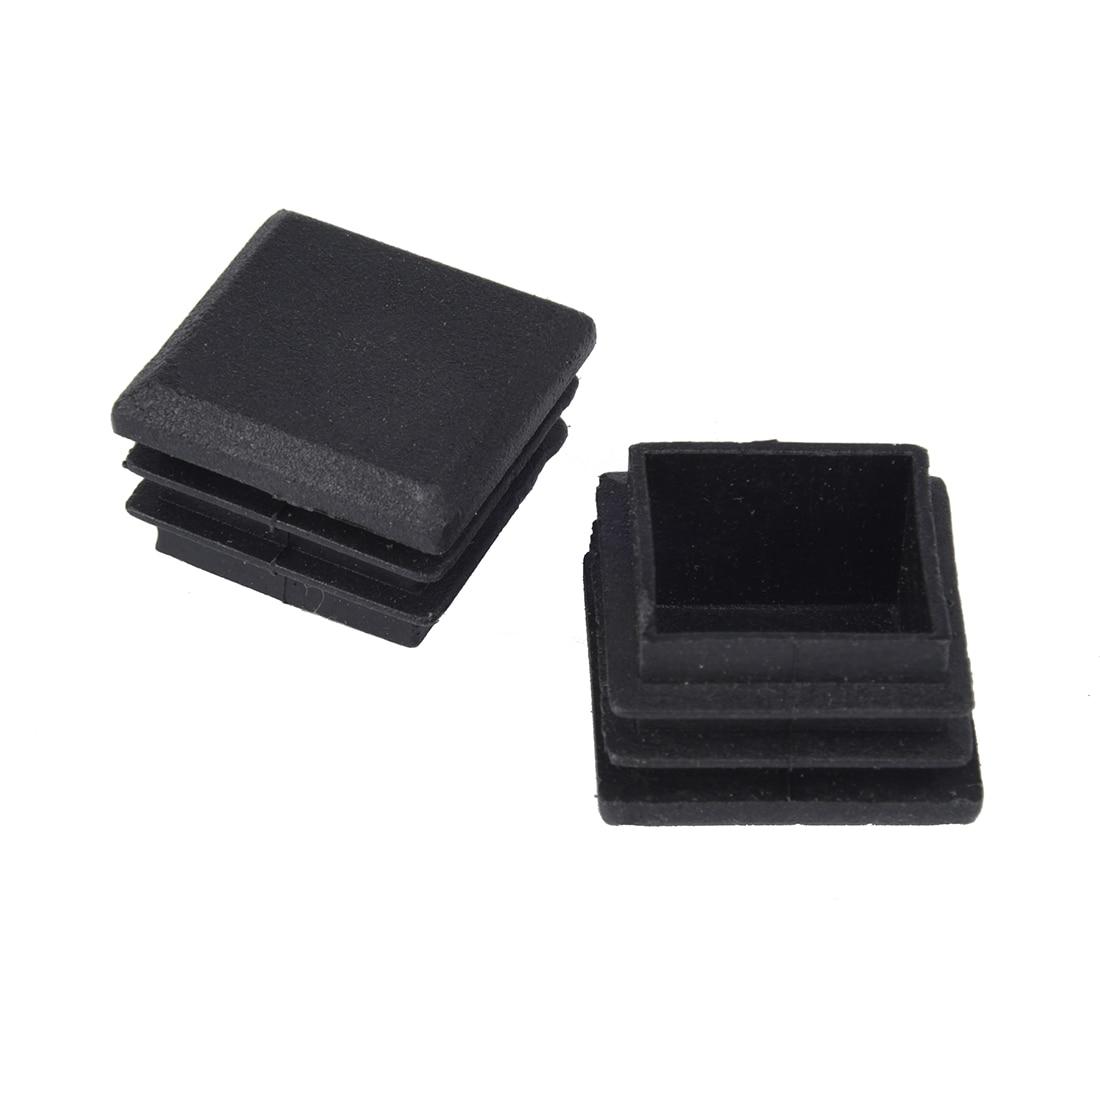 Promotion! 10 Pcs Plastic Black  Square Tube Inserts End Blanking Cap 25mm X 25mm